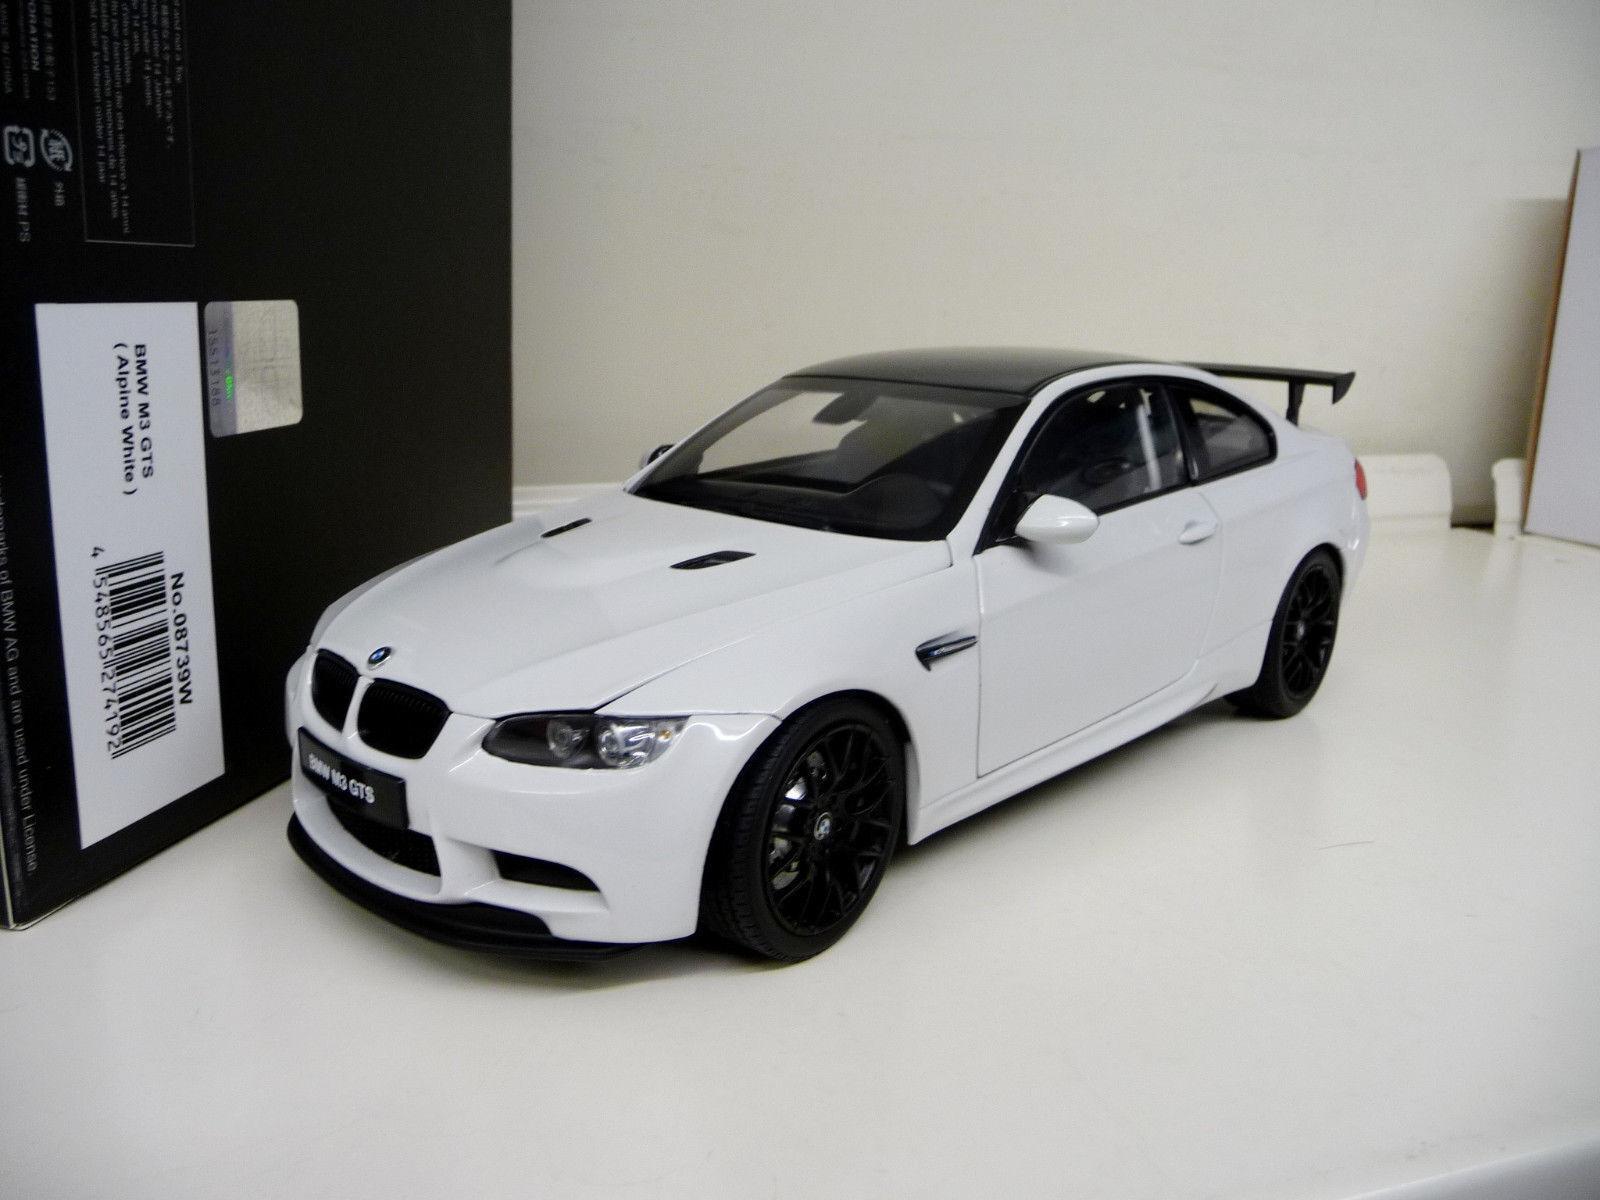 1:18 1:18 1:18 Kyosho BMW m3 GTS coupé e92 Blanc White Neuf newneu New 9edfe6